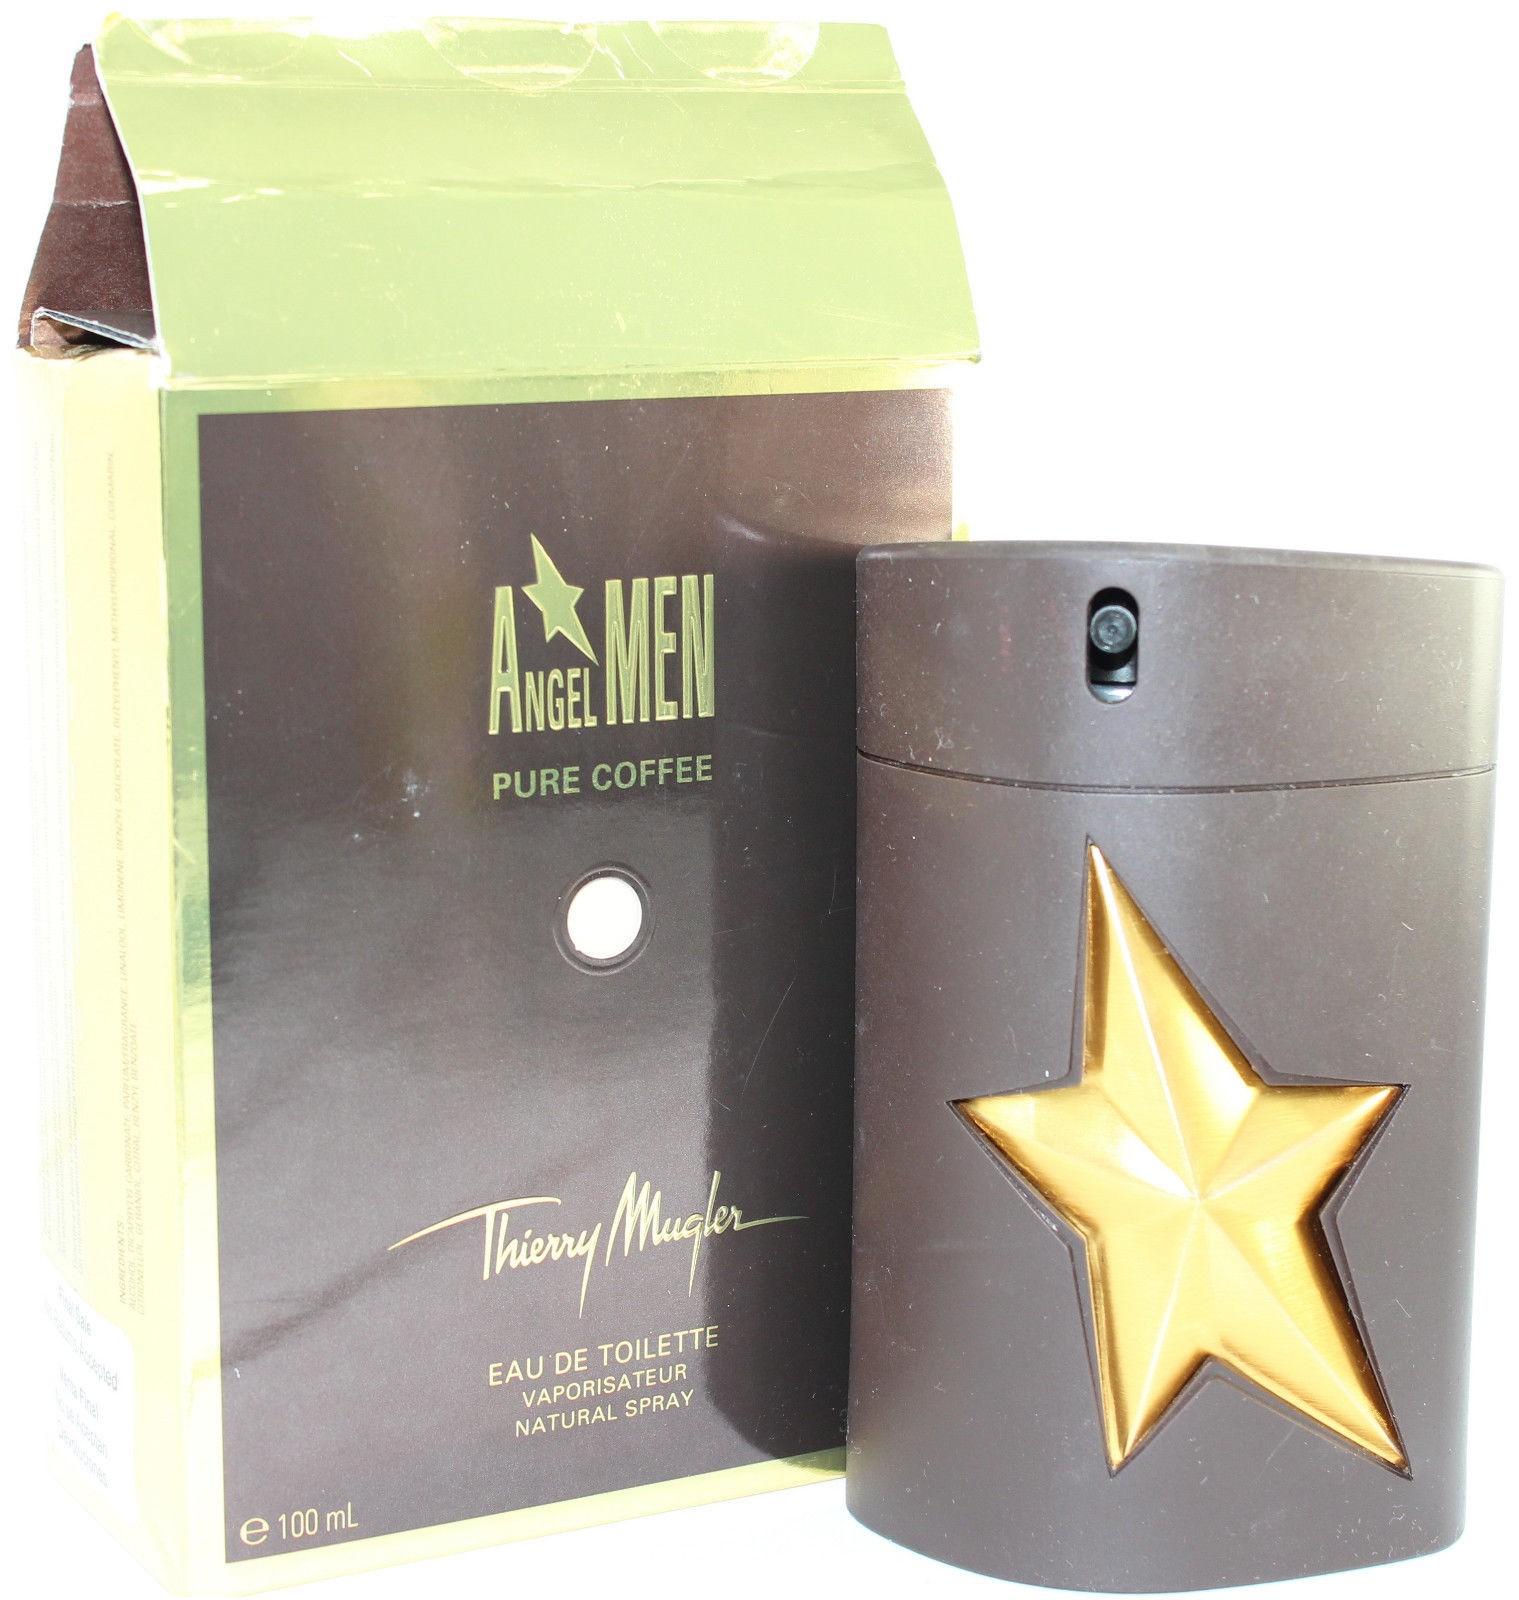 Mugler A*men Pure Coffee аромат для мужчин